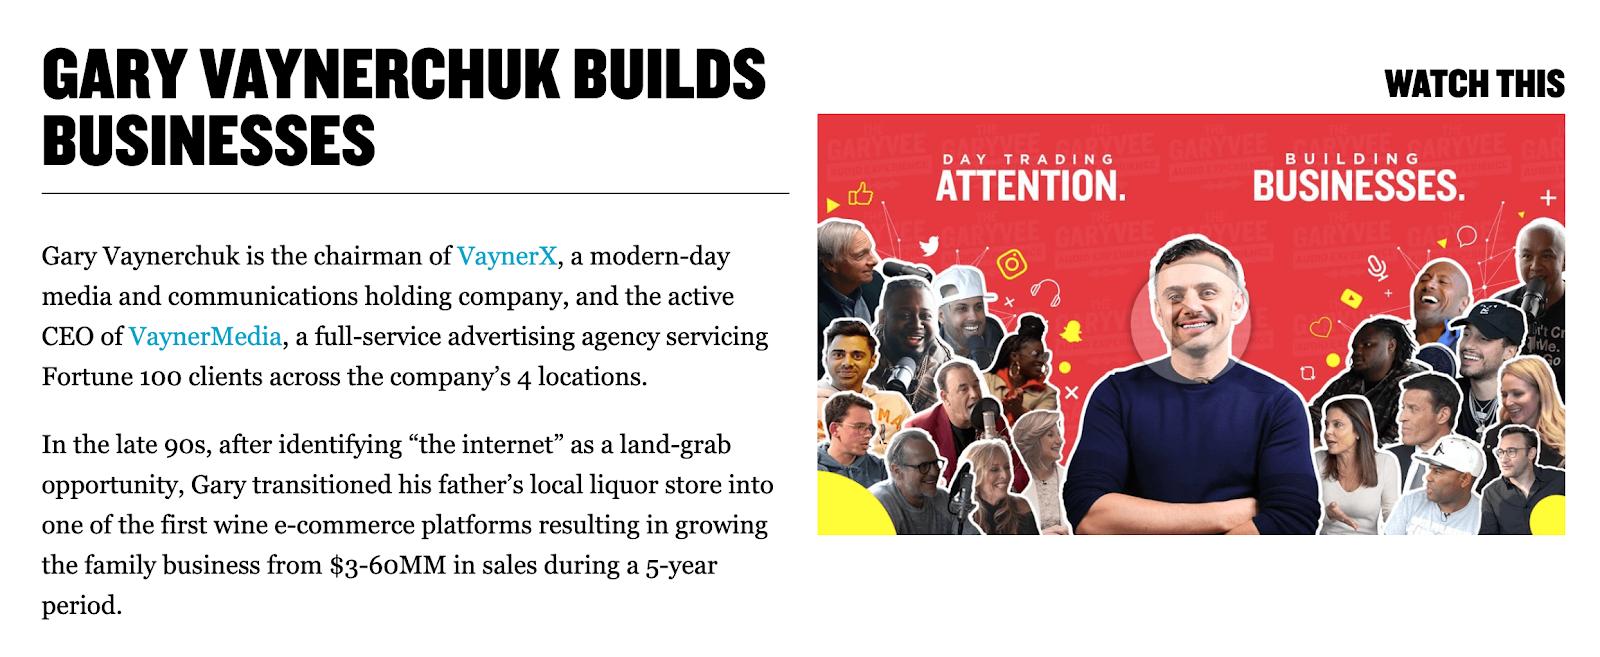 Gary Vaynerchuck | CEO of VaynerMedia